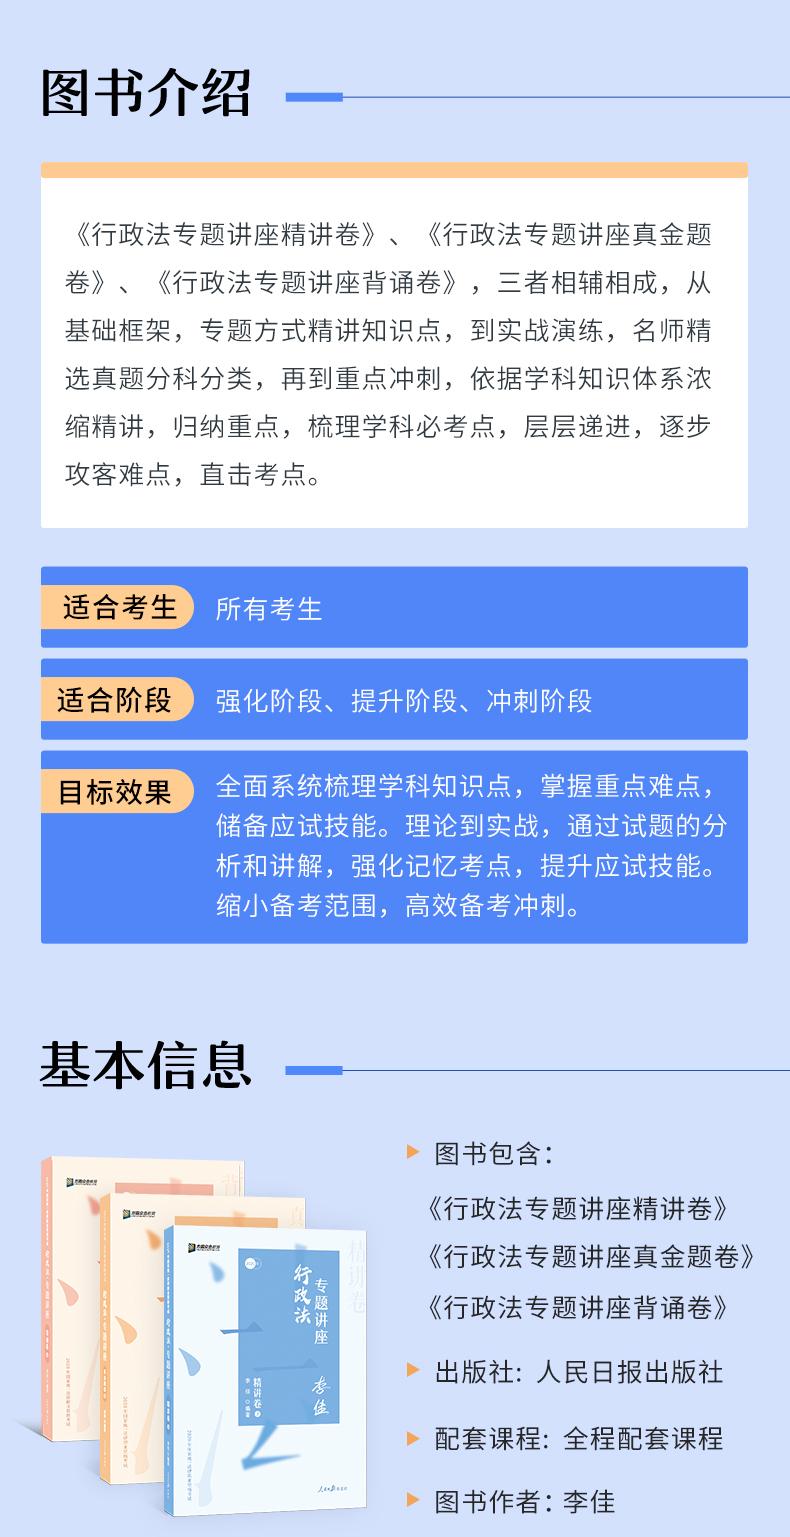 行政法大包-_03.png